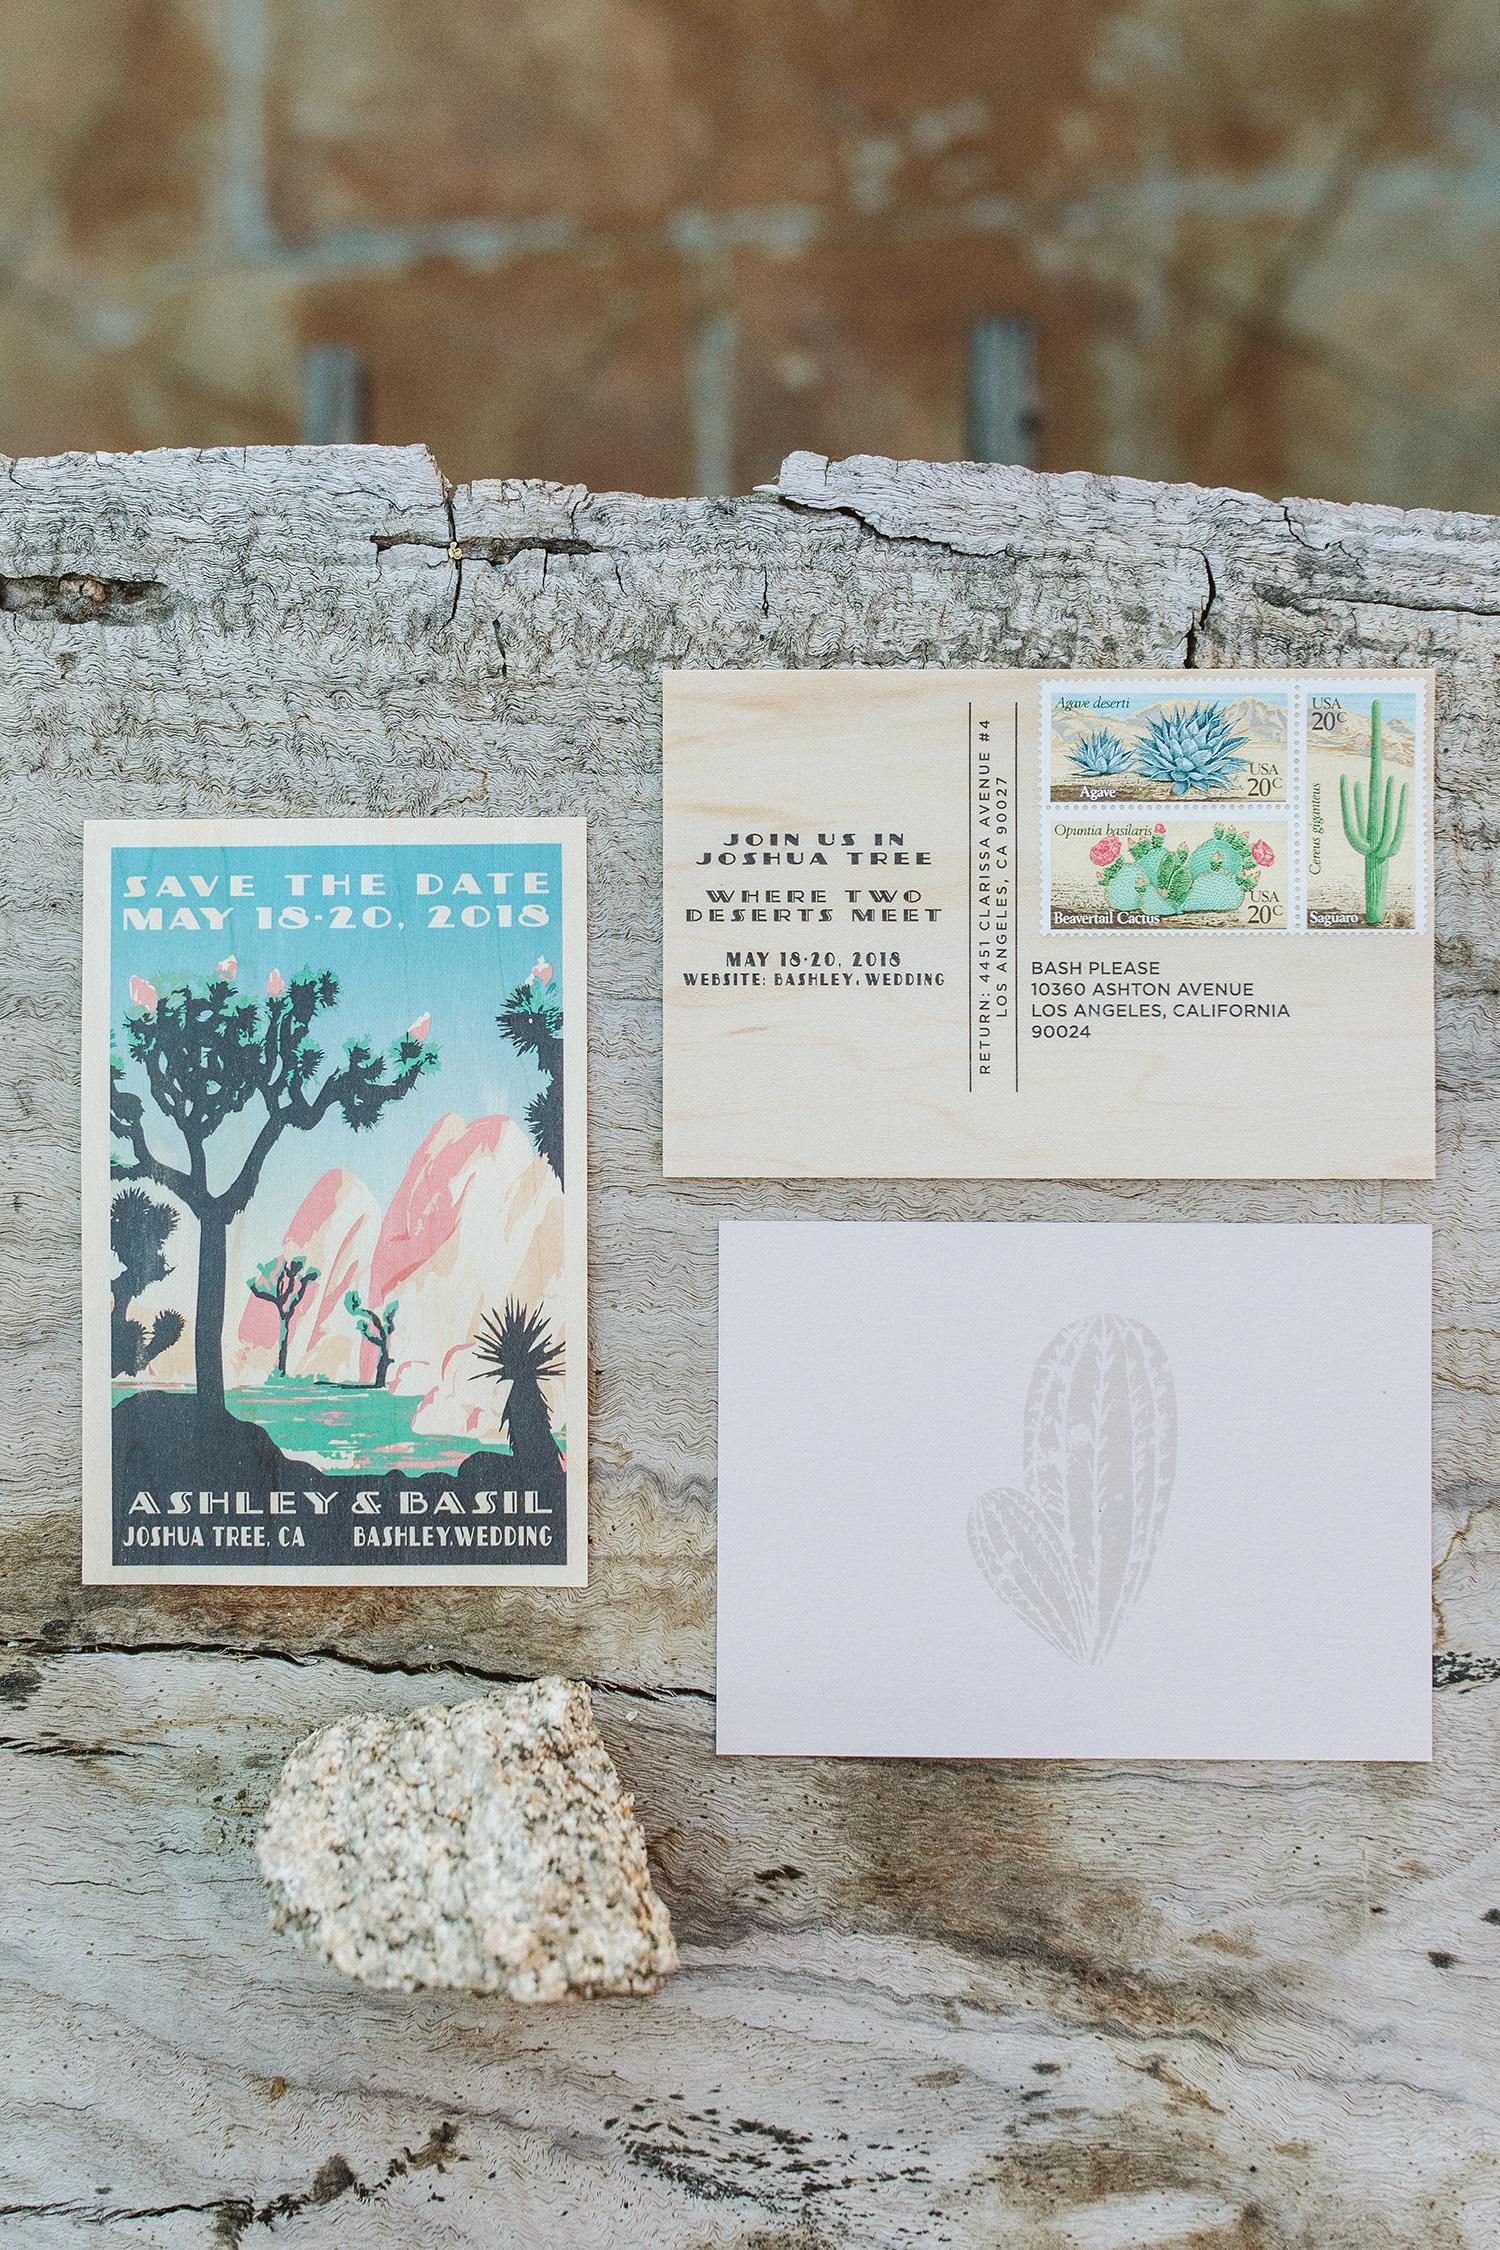 ashley basil wedding save the date postcard